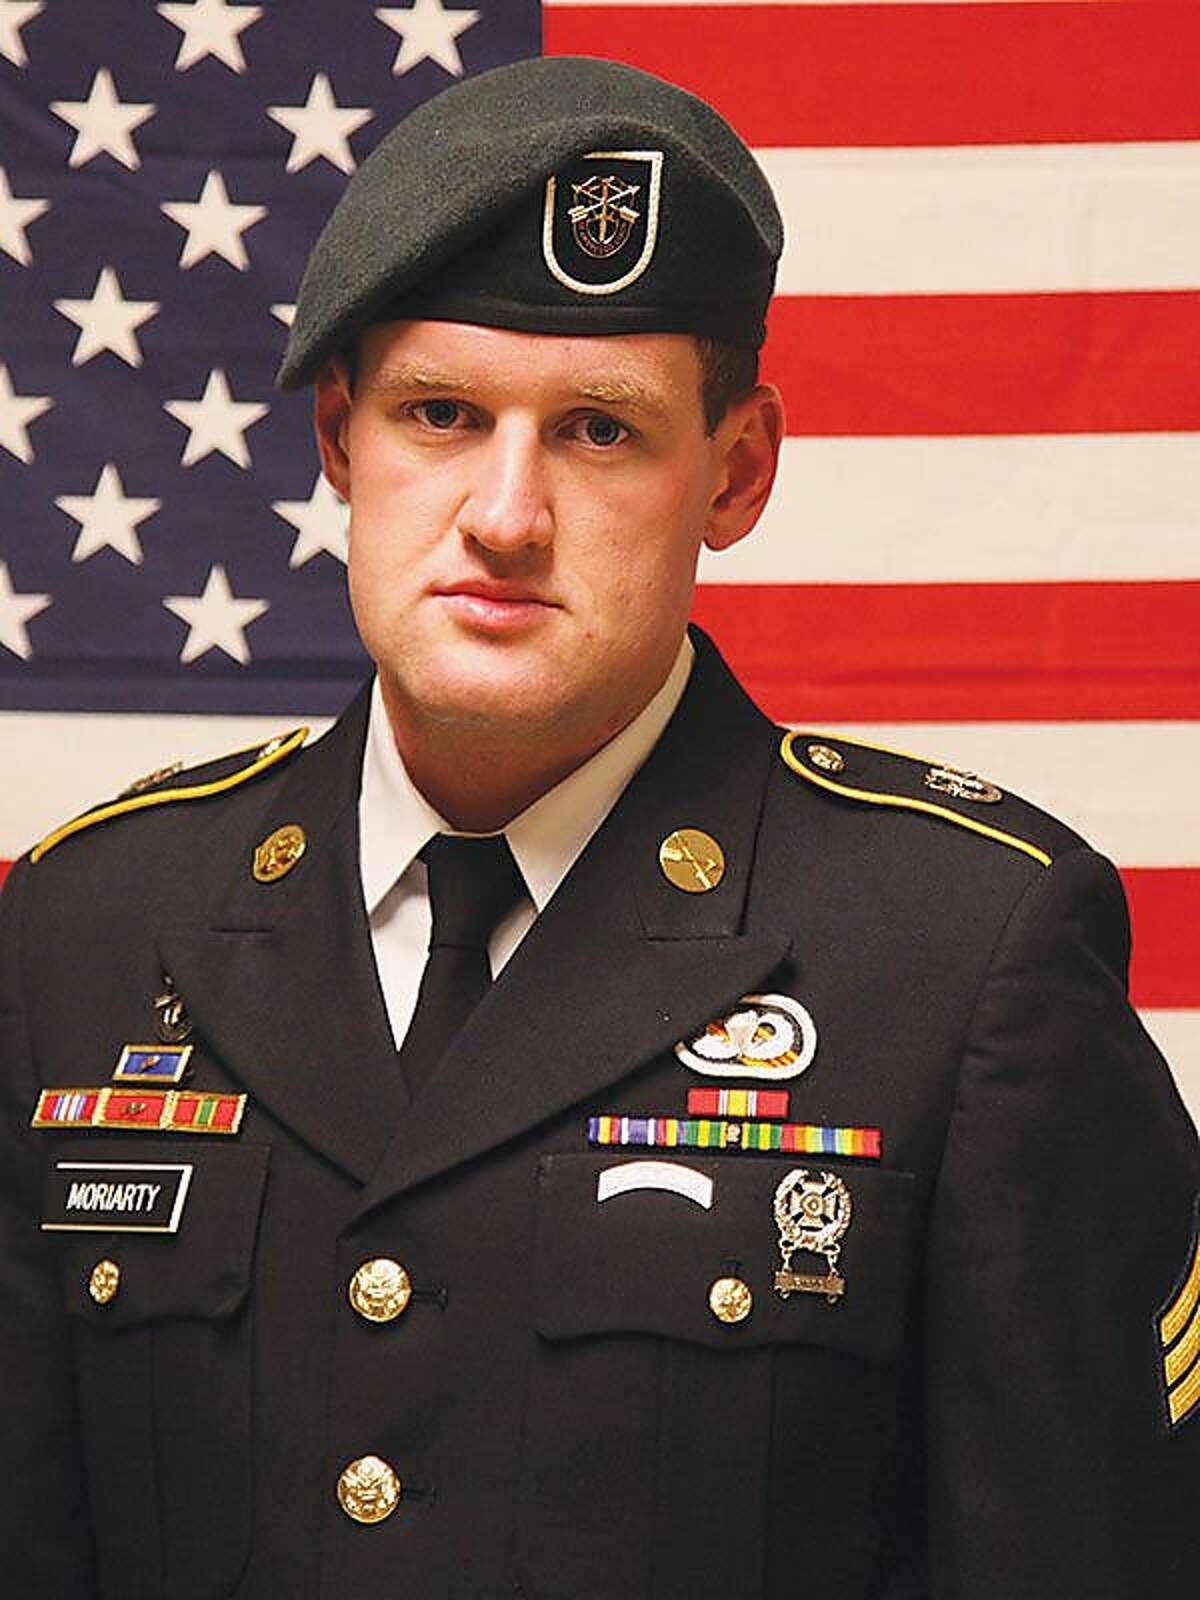 James F. Moriarty Kerrville Army Staff Sergeant Died: 11/6/2016, Jordan